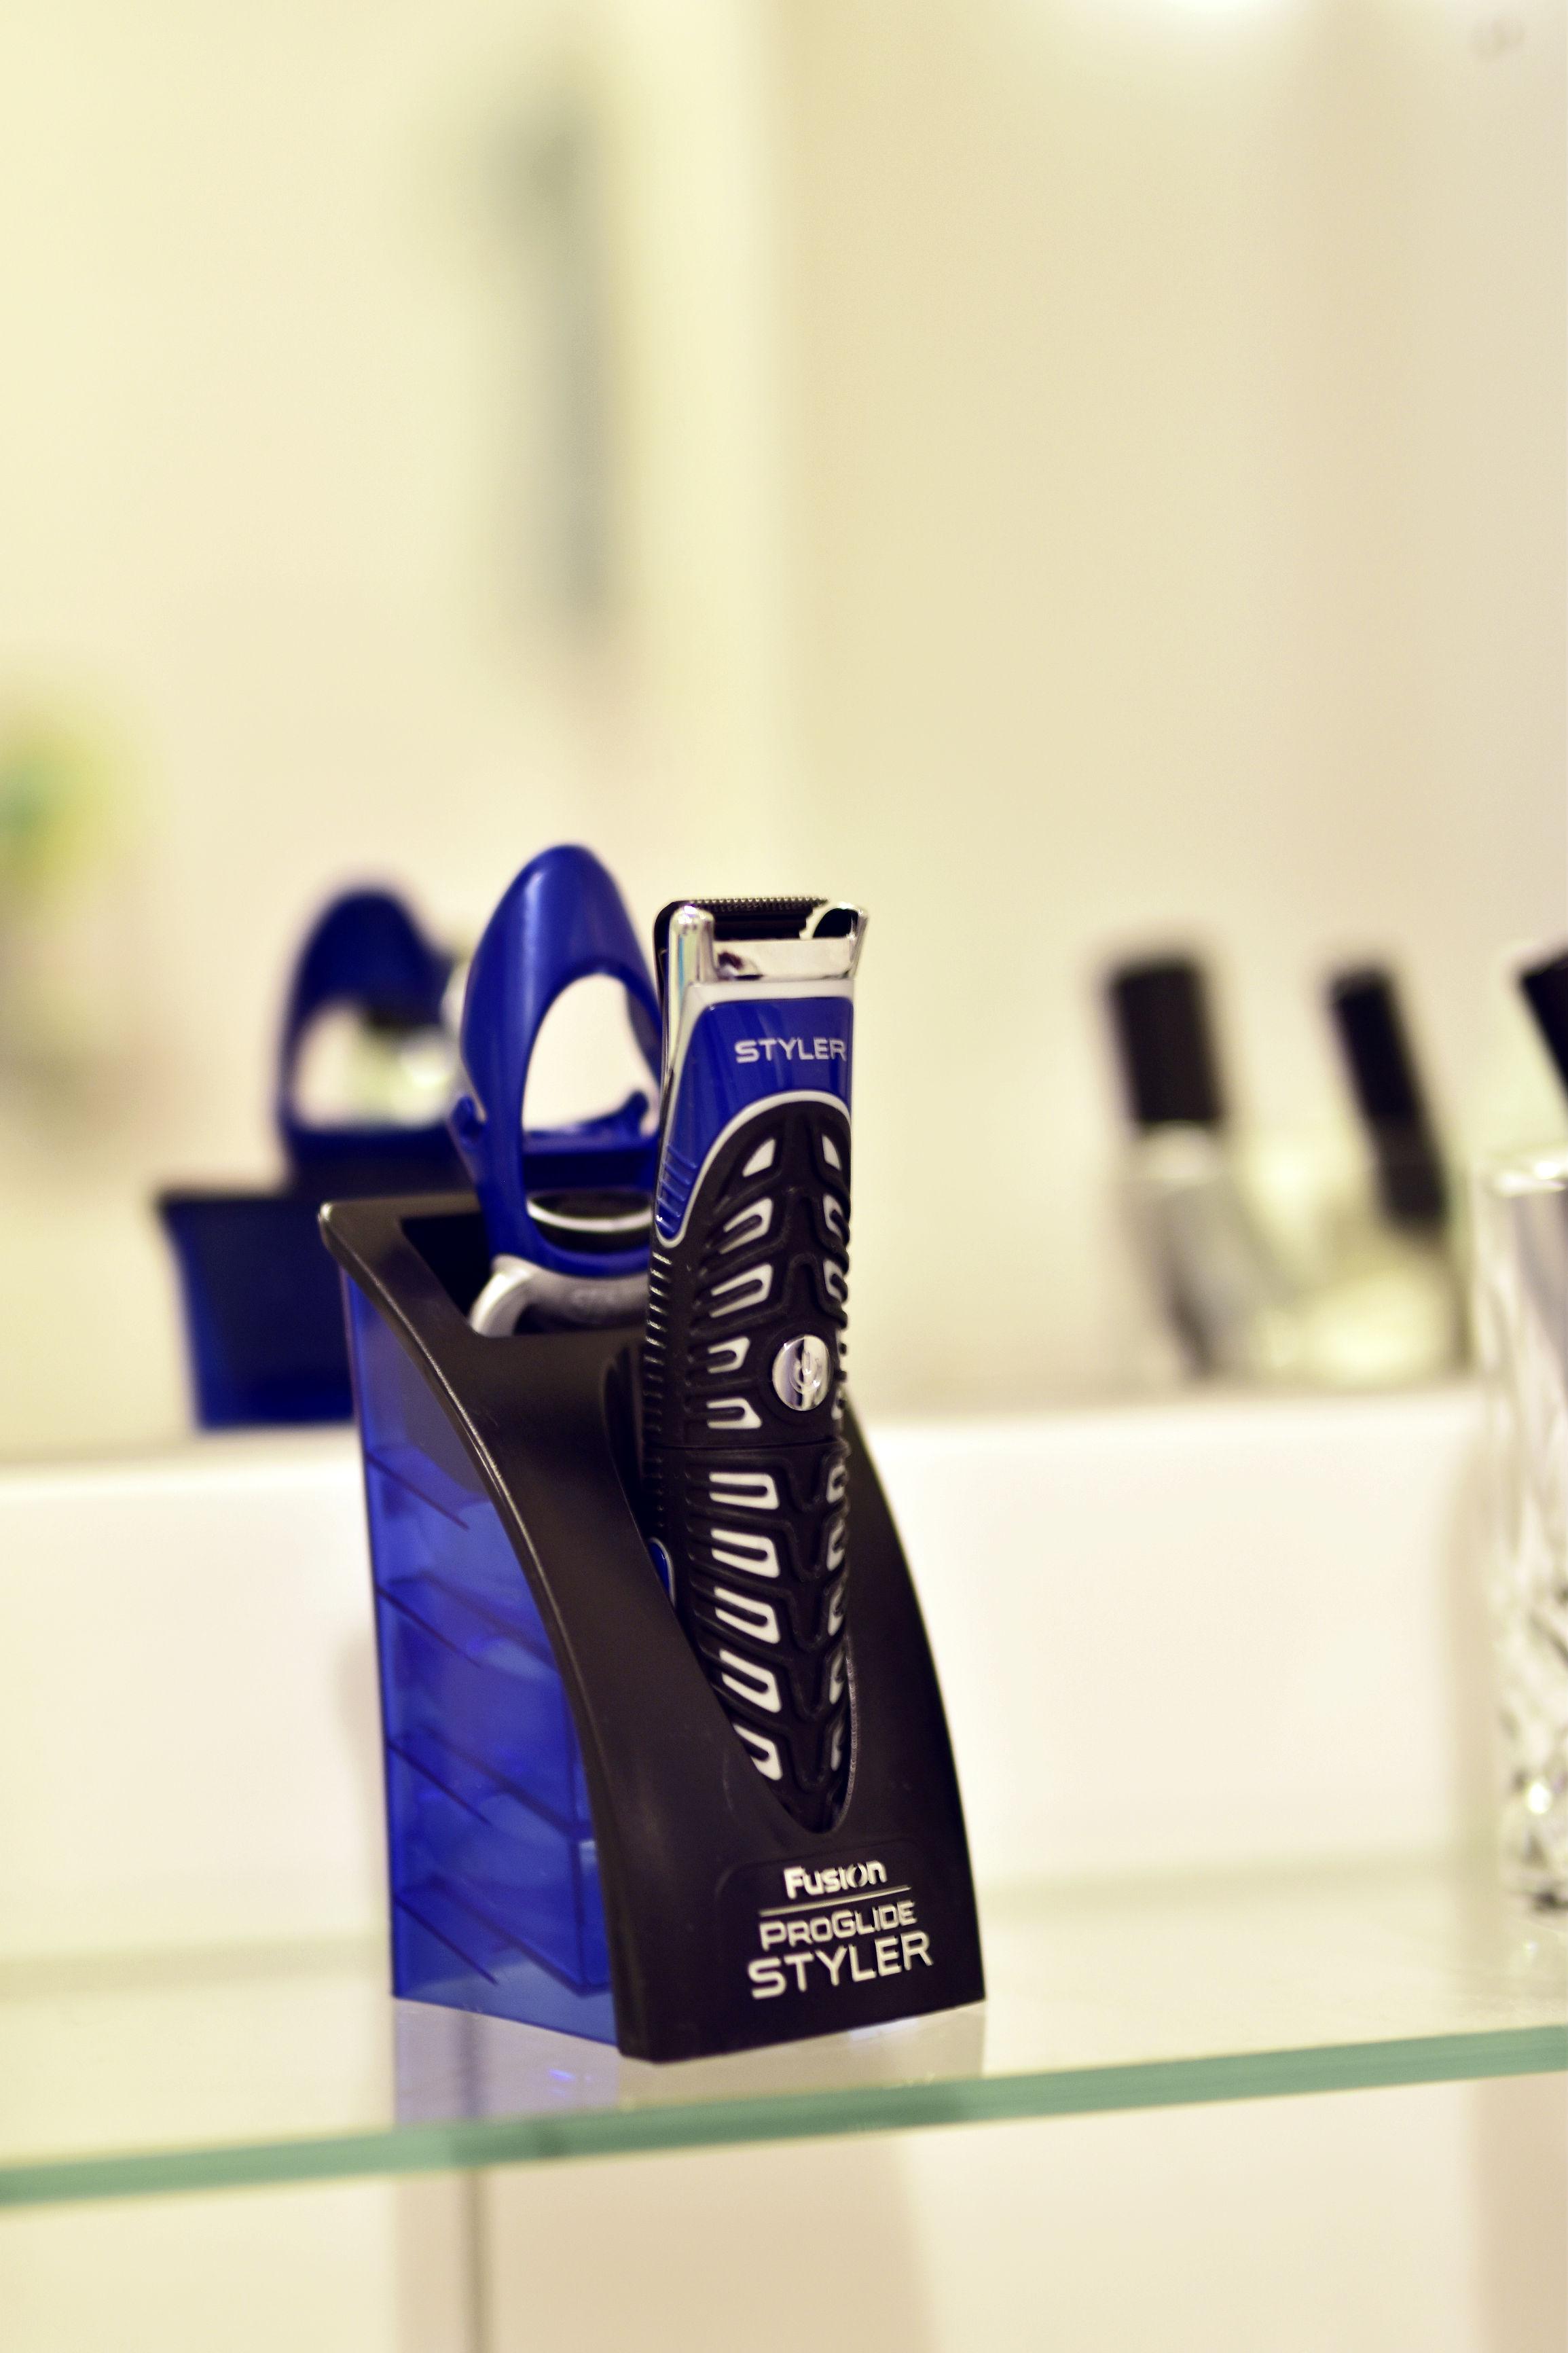 tommeezjerry-styleblog-maennerblog-maenner-modeblog-berlin-berlinblog-maennermodeblog-grooming-pflege-gillette-fusion-proglide-styler-1